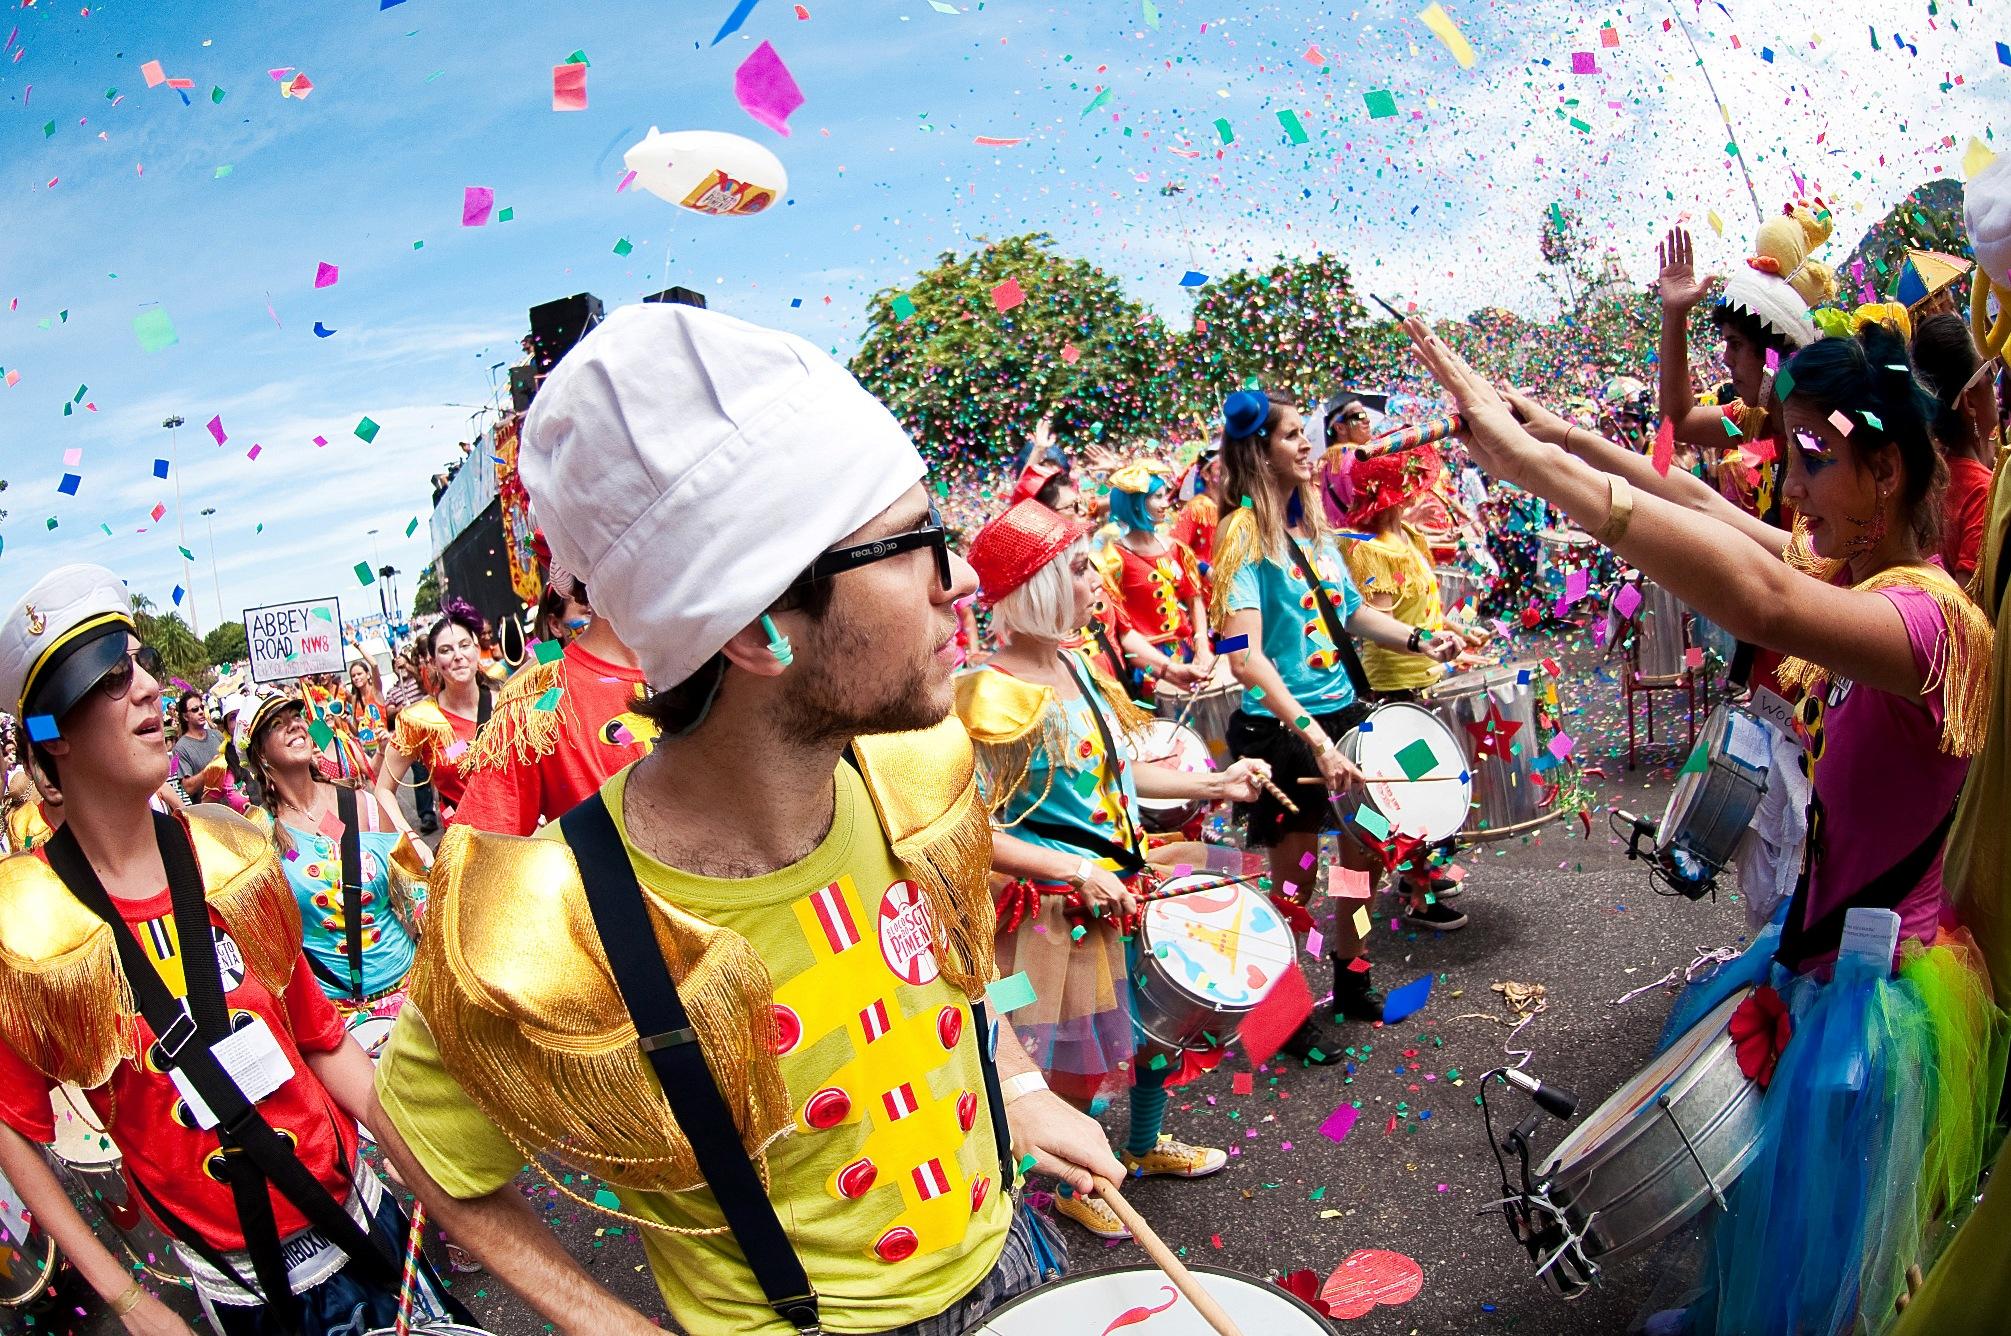 Carnaval sem drama: folia ou descanso?